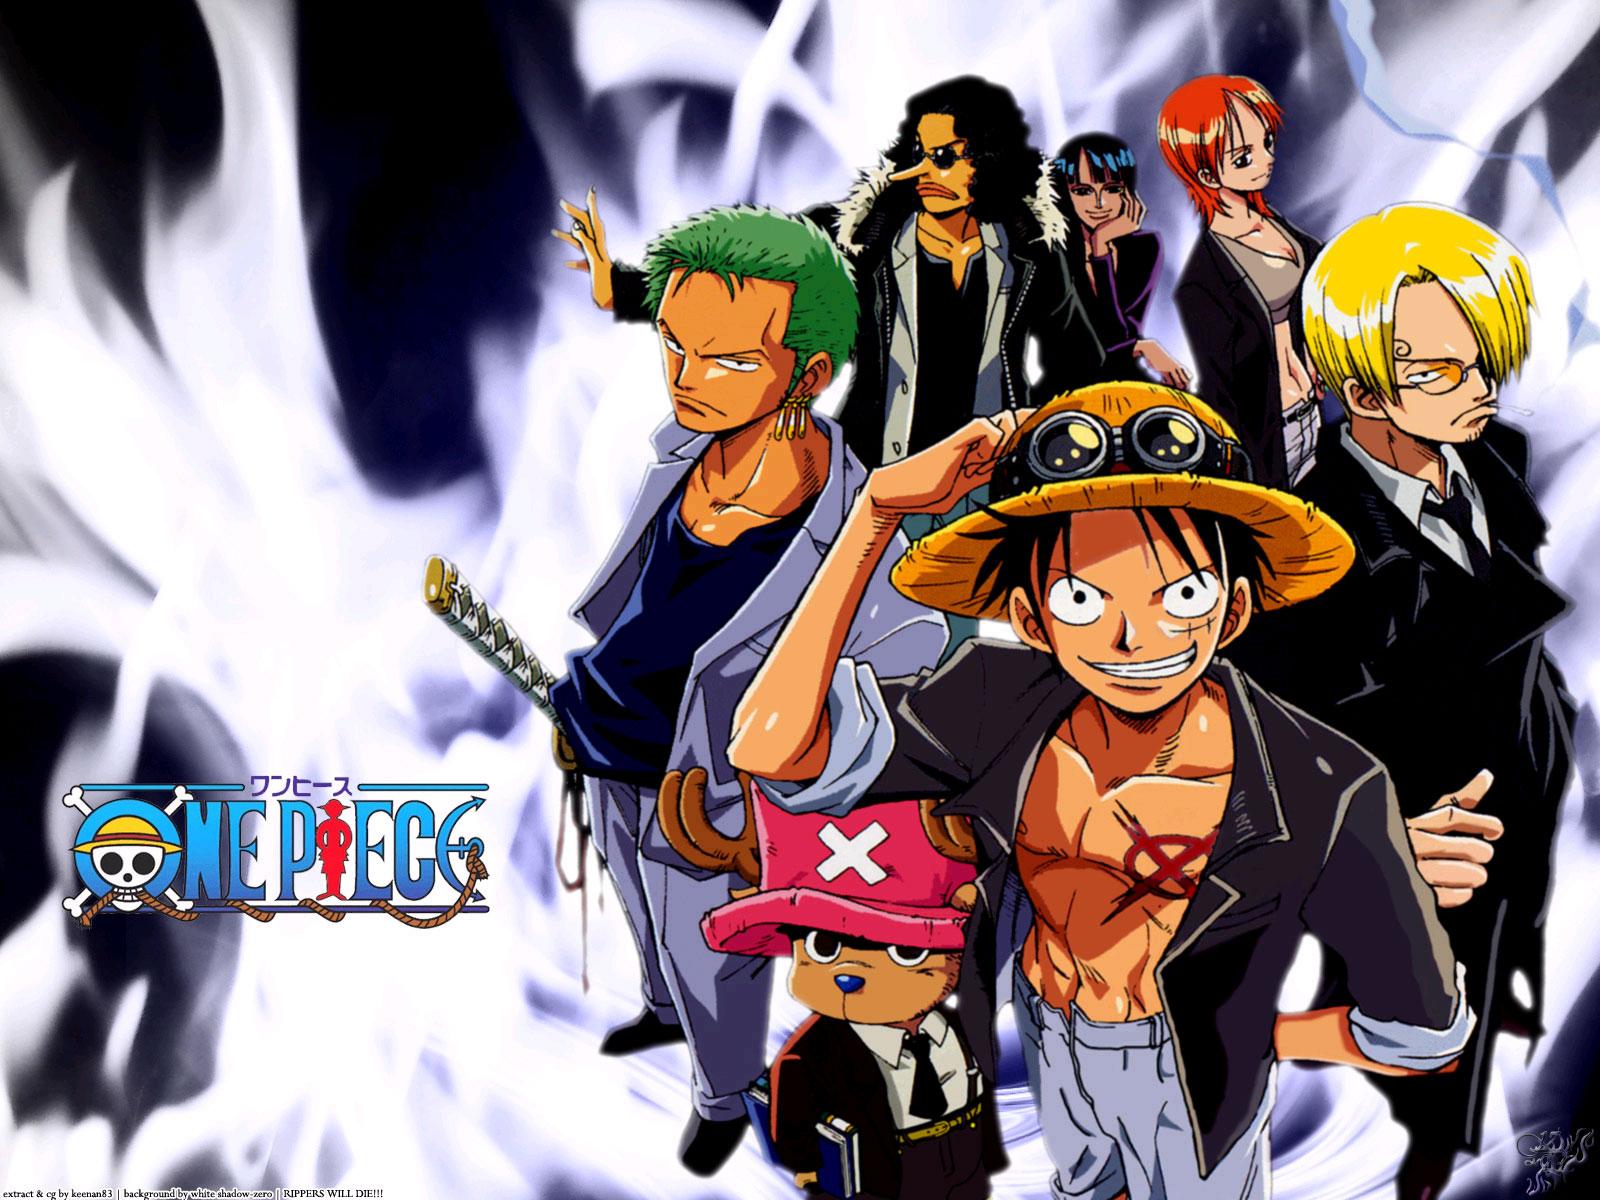 New One Piece Wallpaperjpg 1600x1200